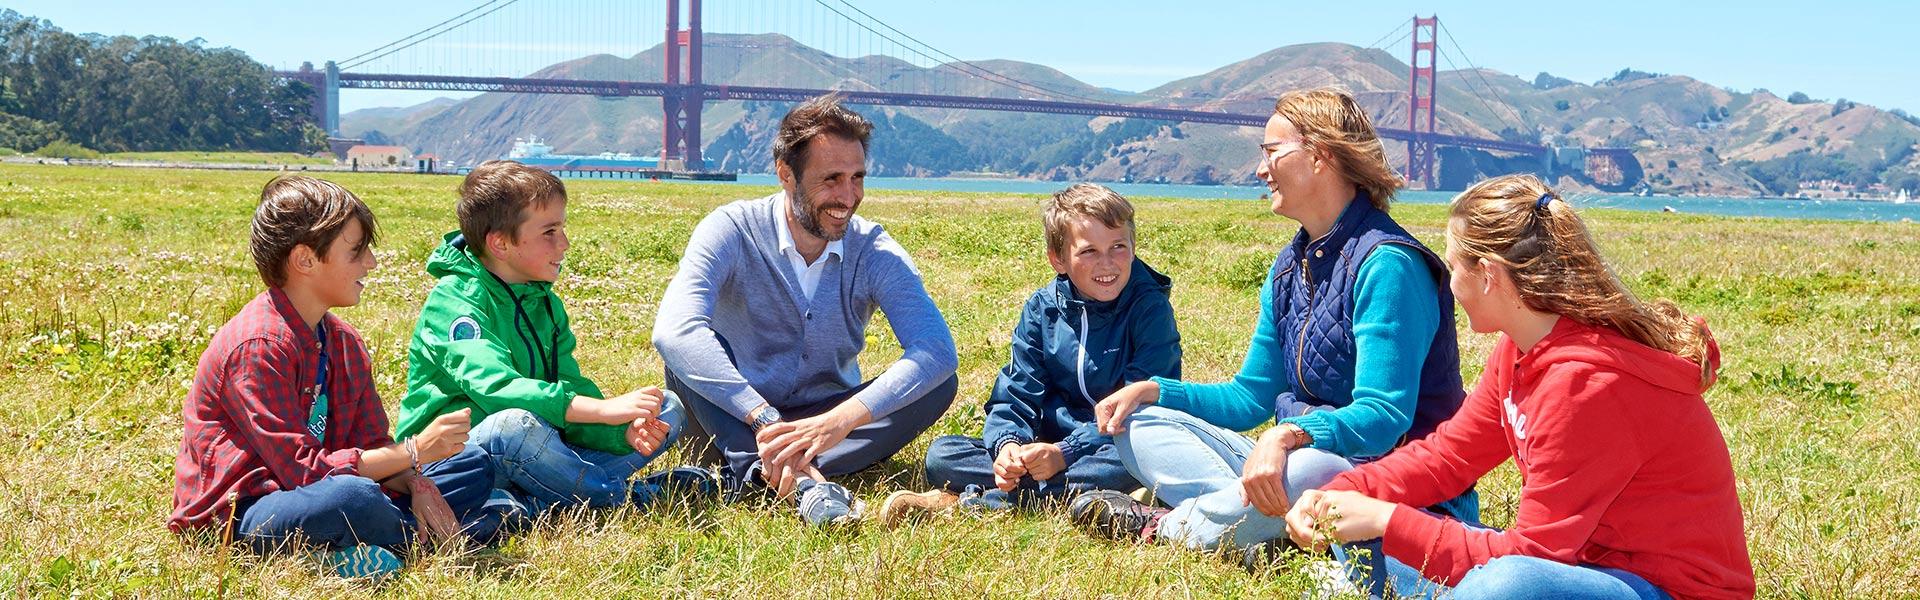 Cursos de idiomas para familias